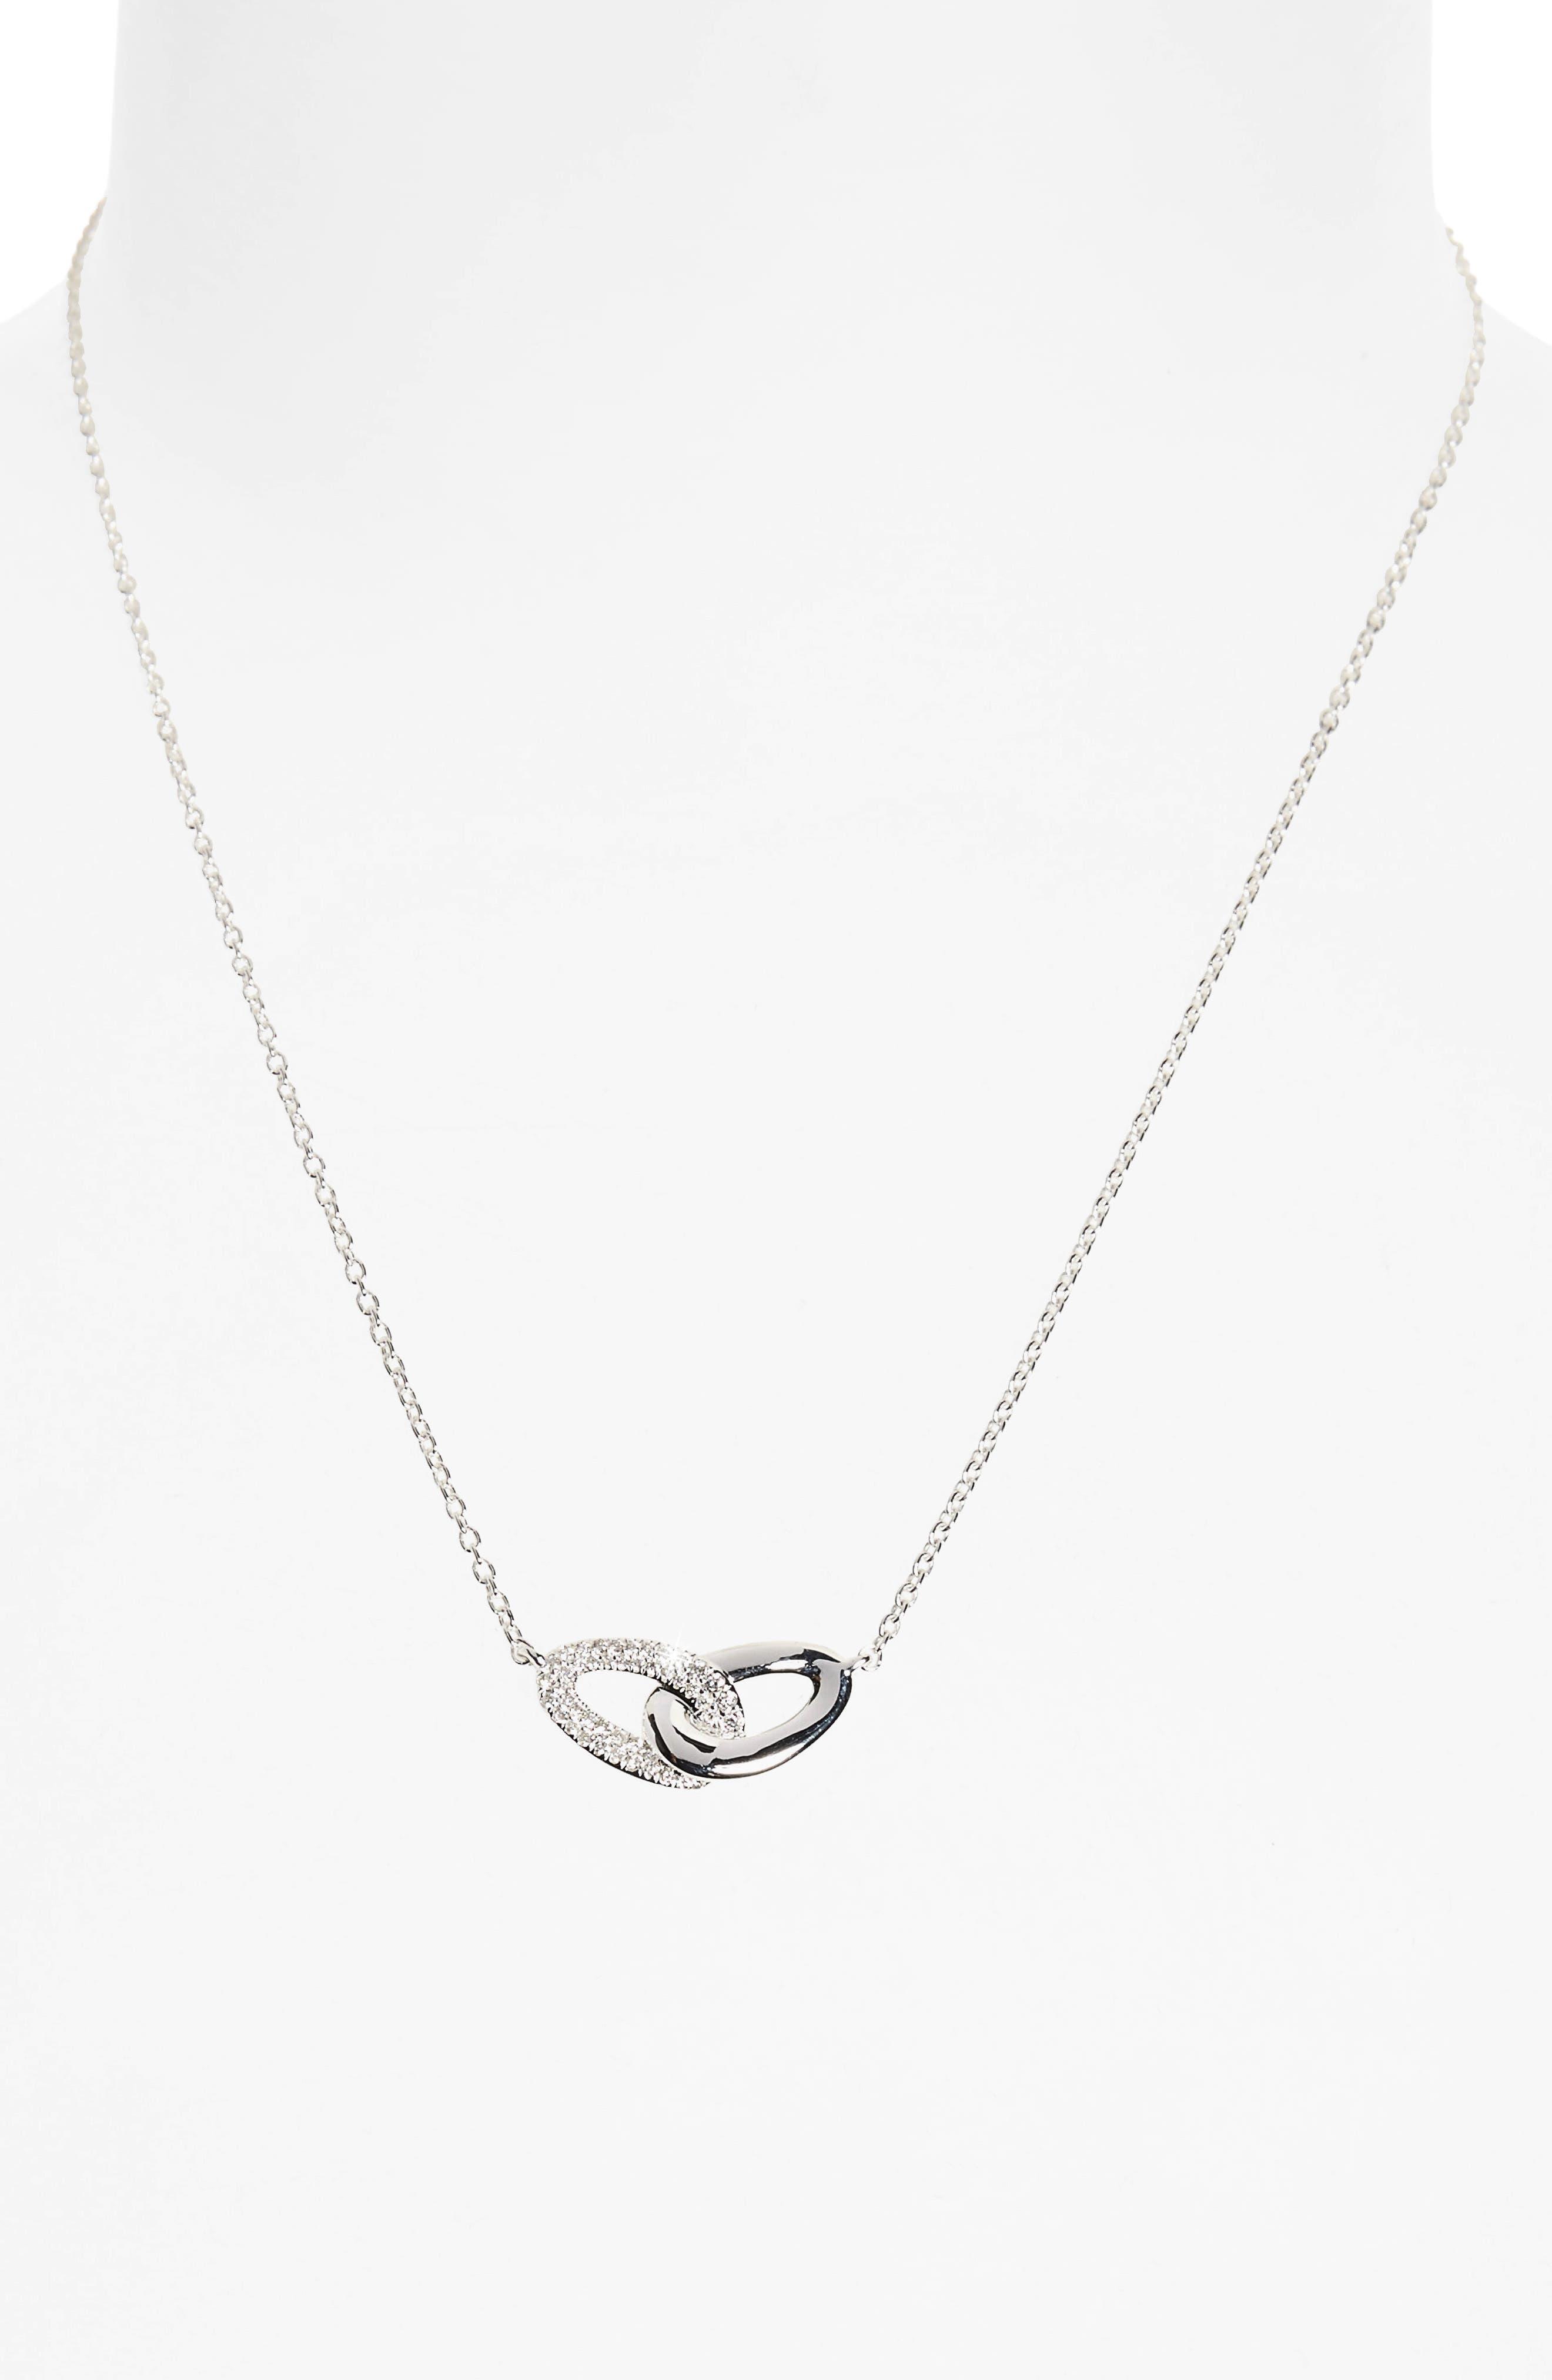 Cherish Interlocking Pendant Necklace,                             Alternate thumbnail 2, color,                             SILVER